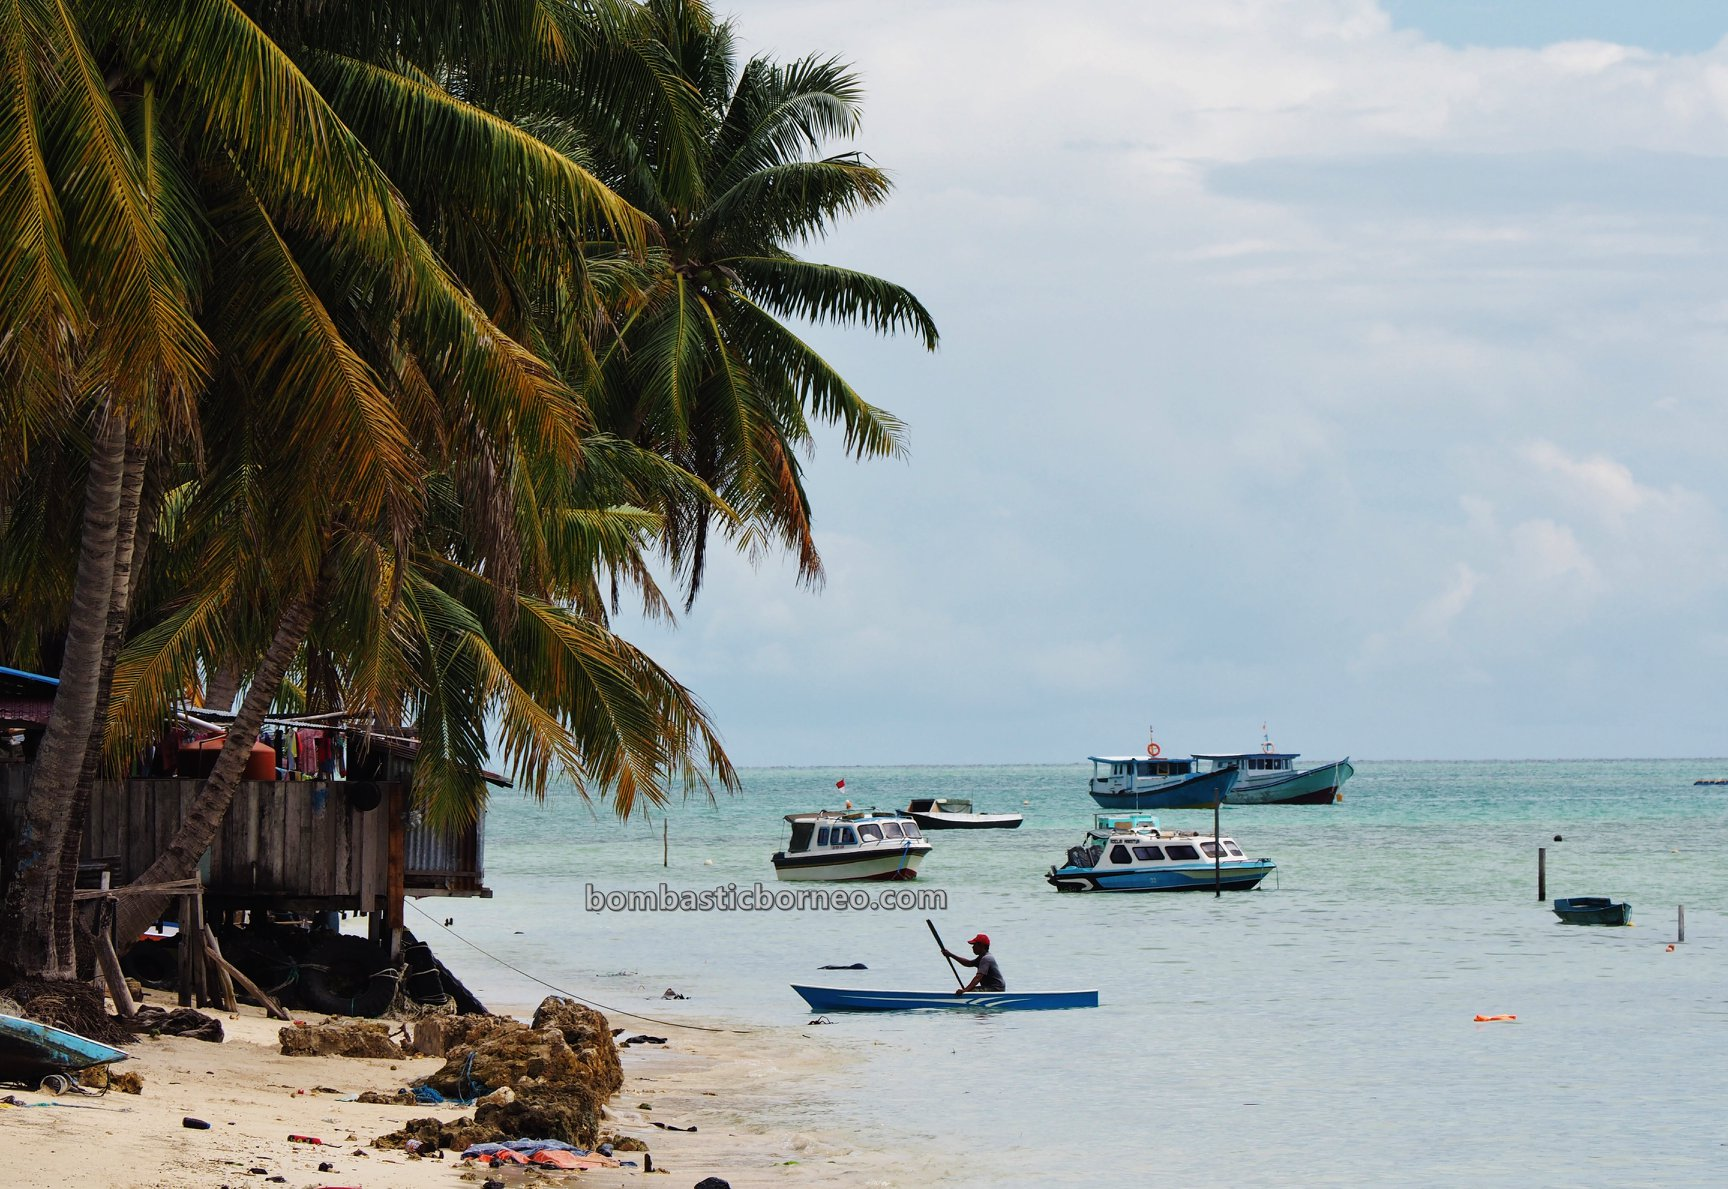 Kepulauan Derawan, Pasir Putih, white sandy beaches, Maratua Island, Kampung Payung-Payung, Destination, exploration, nature, vacation, Berau, Kalimantan Timur, Pesona Indonesia, Tourism, travel guide, Trans Borneo,